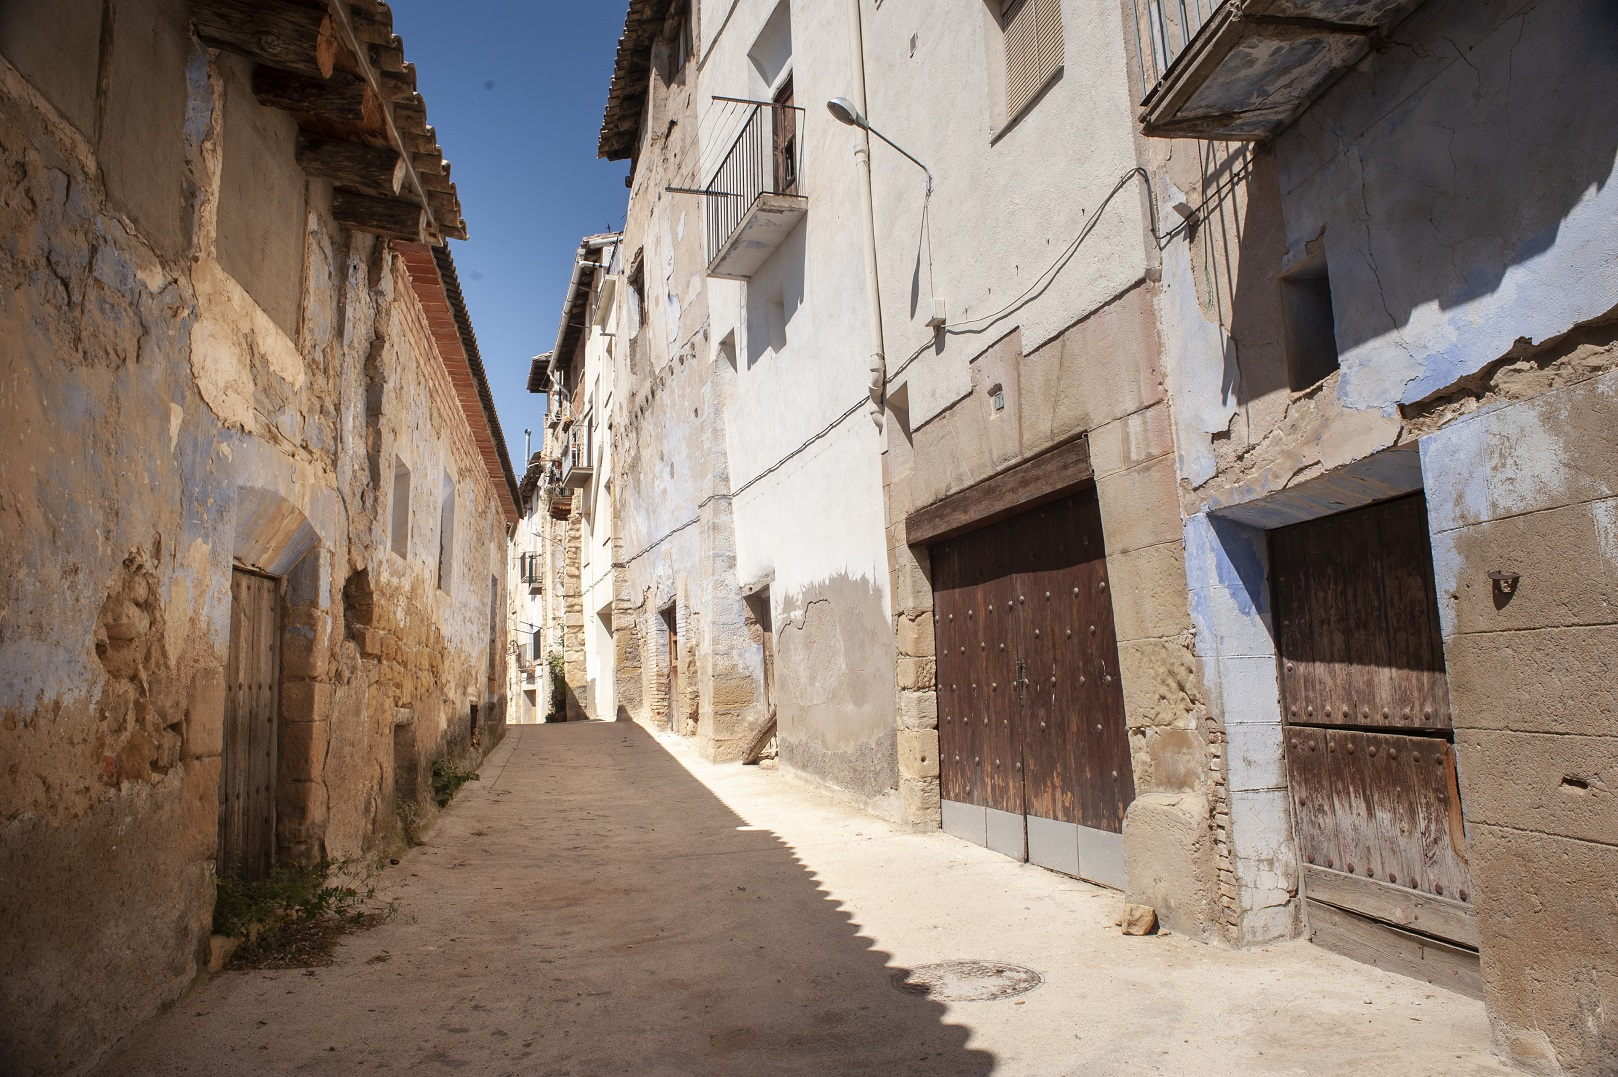 Privilegiado, o pueblo histórico de La Fresneda ainda tem cerca de 500 habitantes. Foto Rosane Marinho